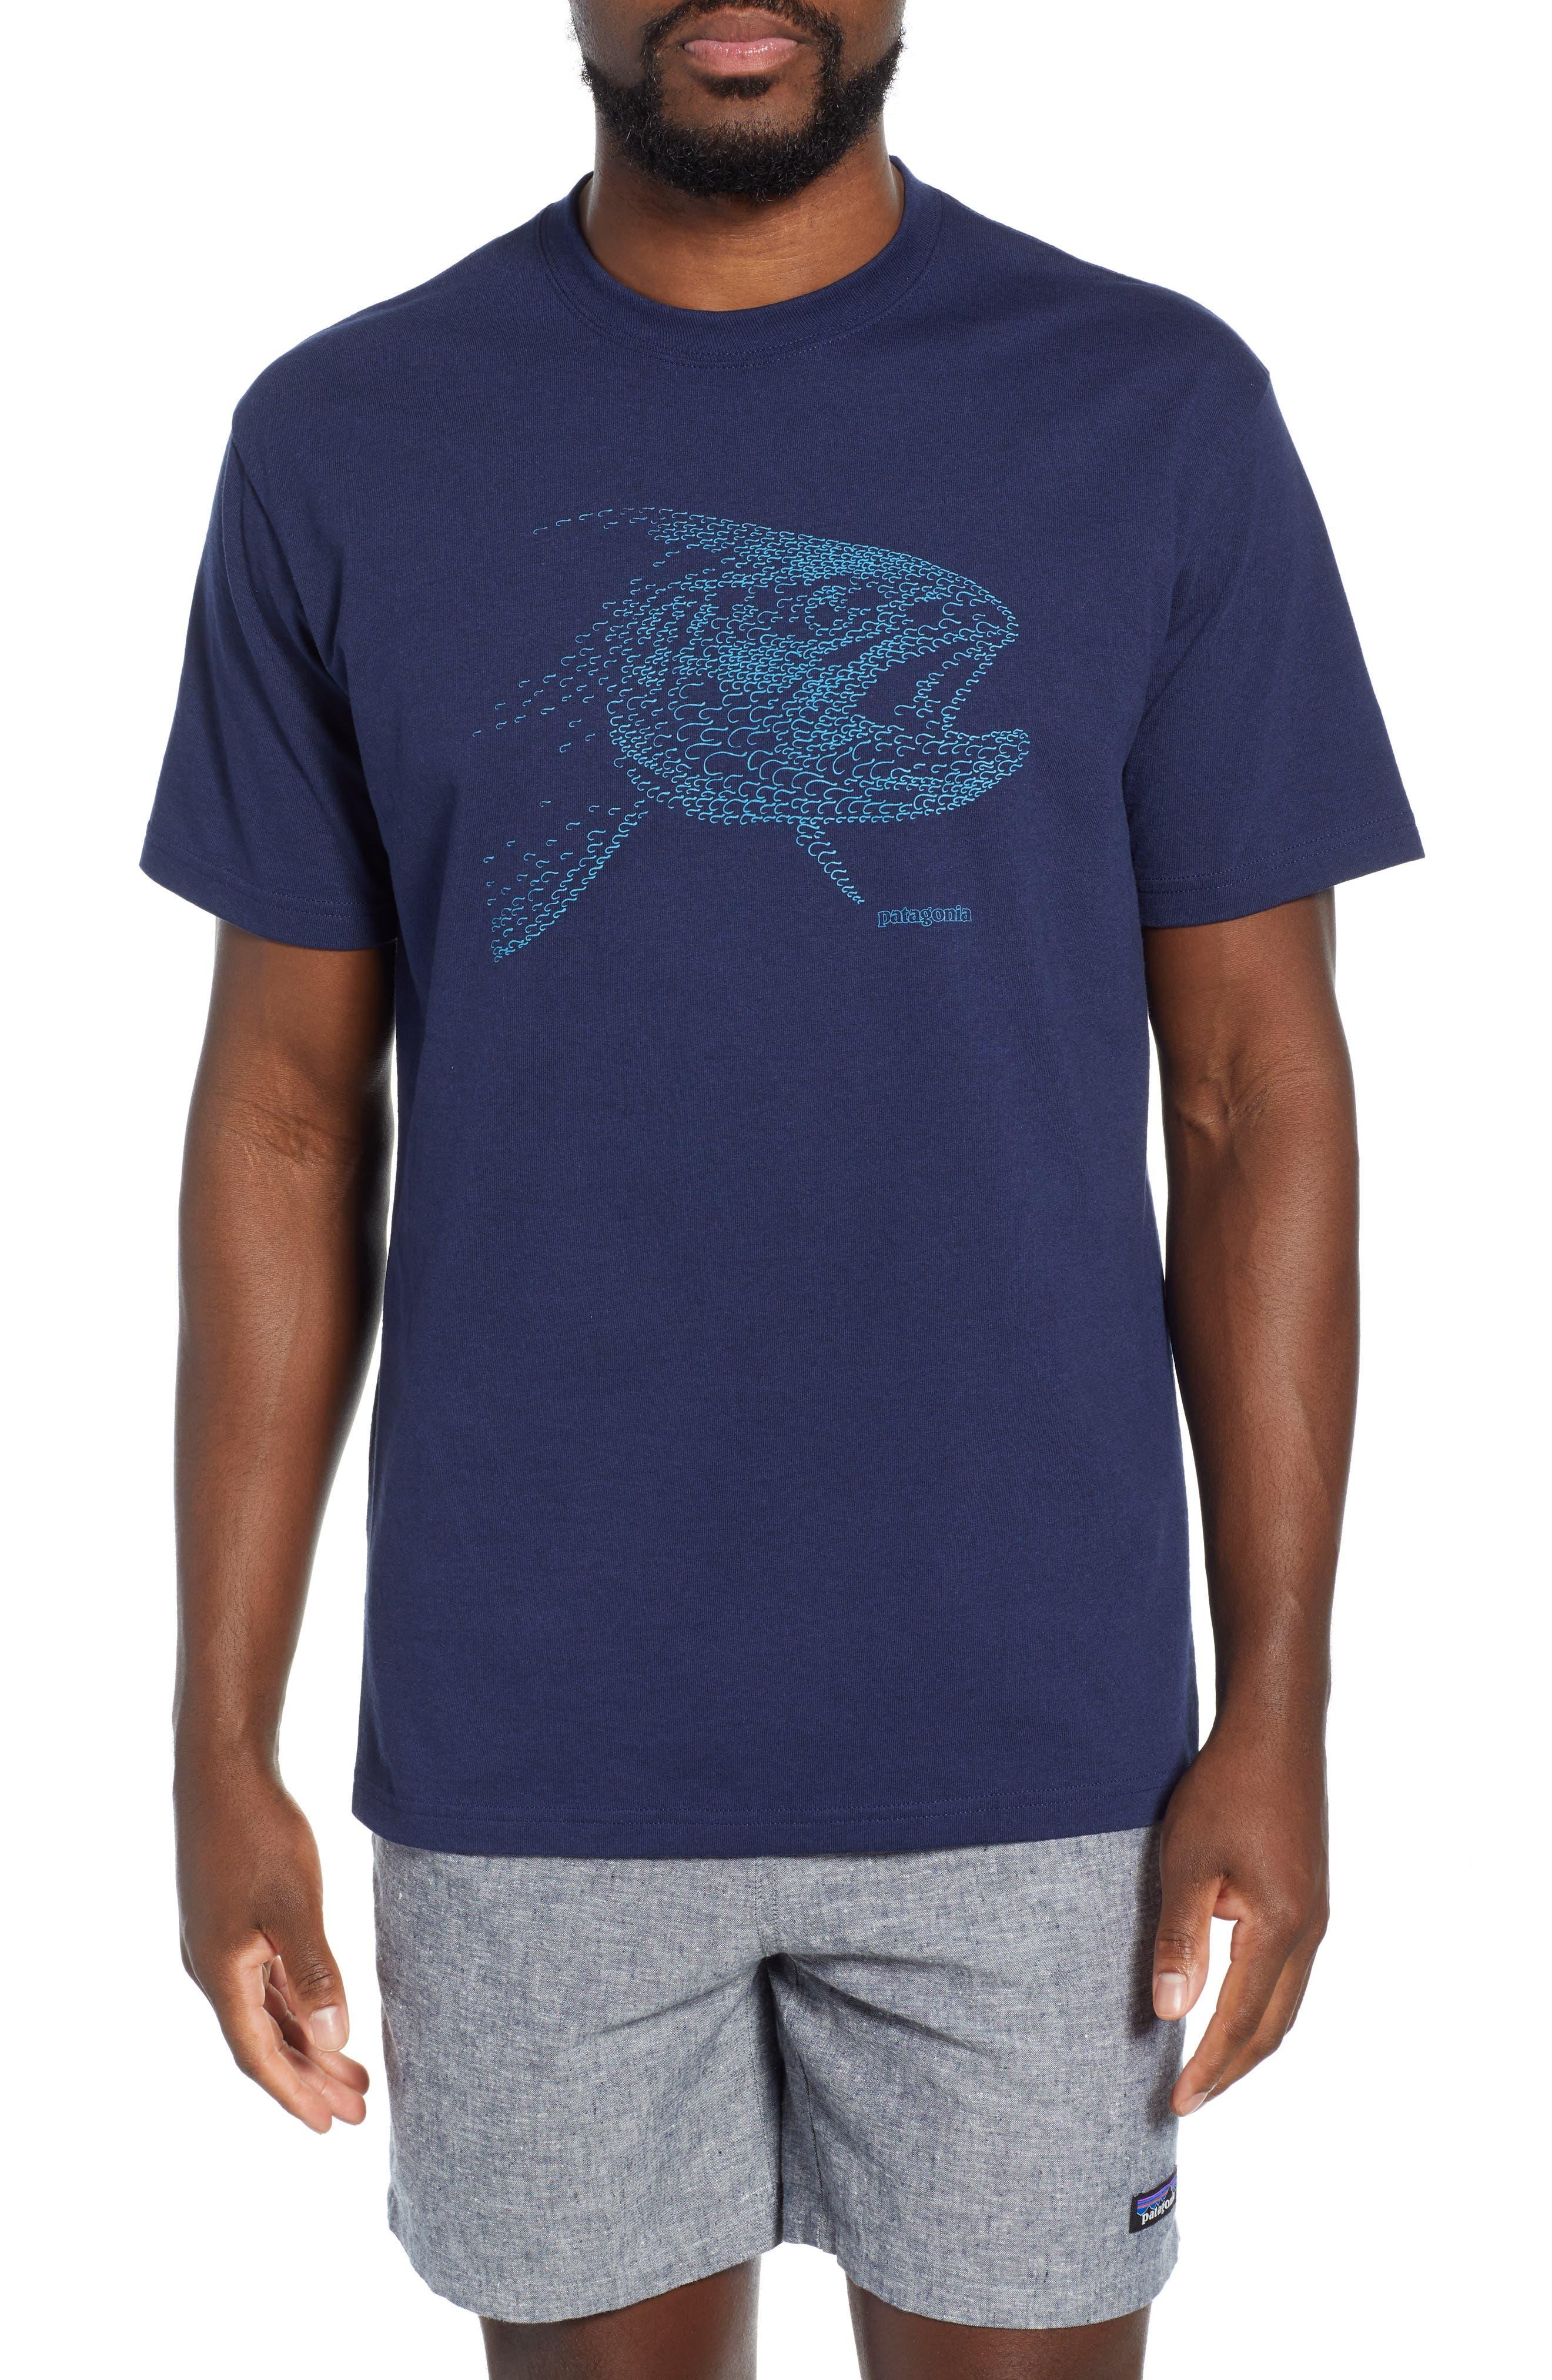 Patagonia Hooked Head Responsibili-Tee T-Shirt, Blue